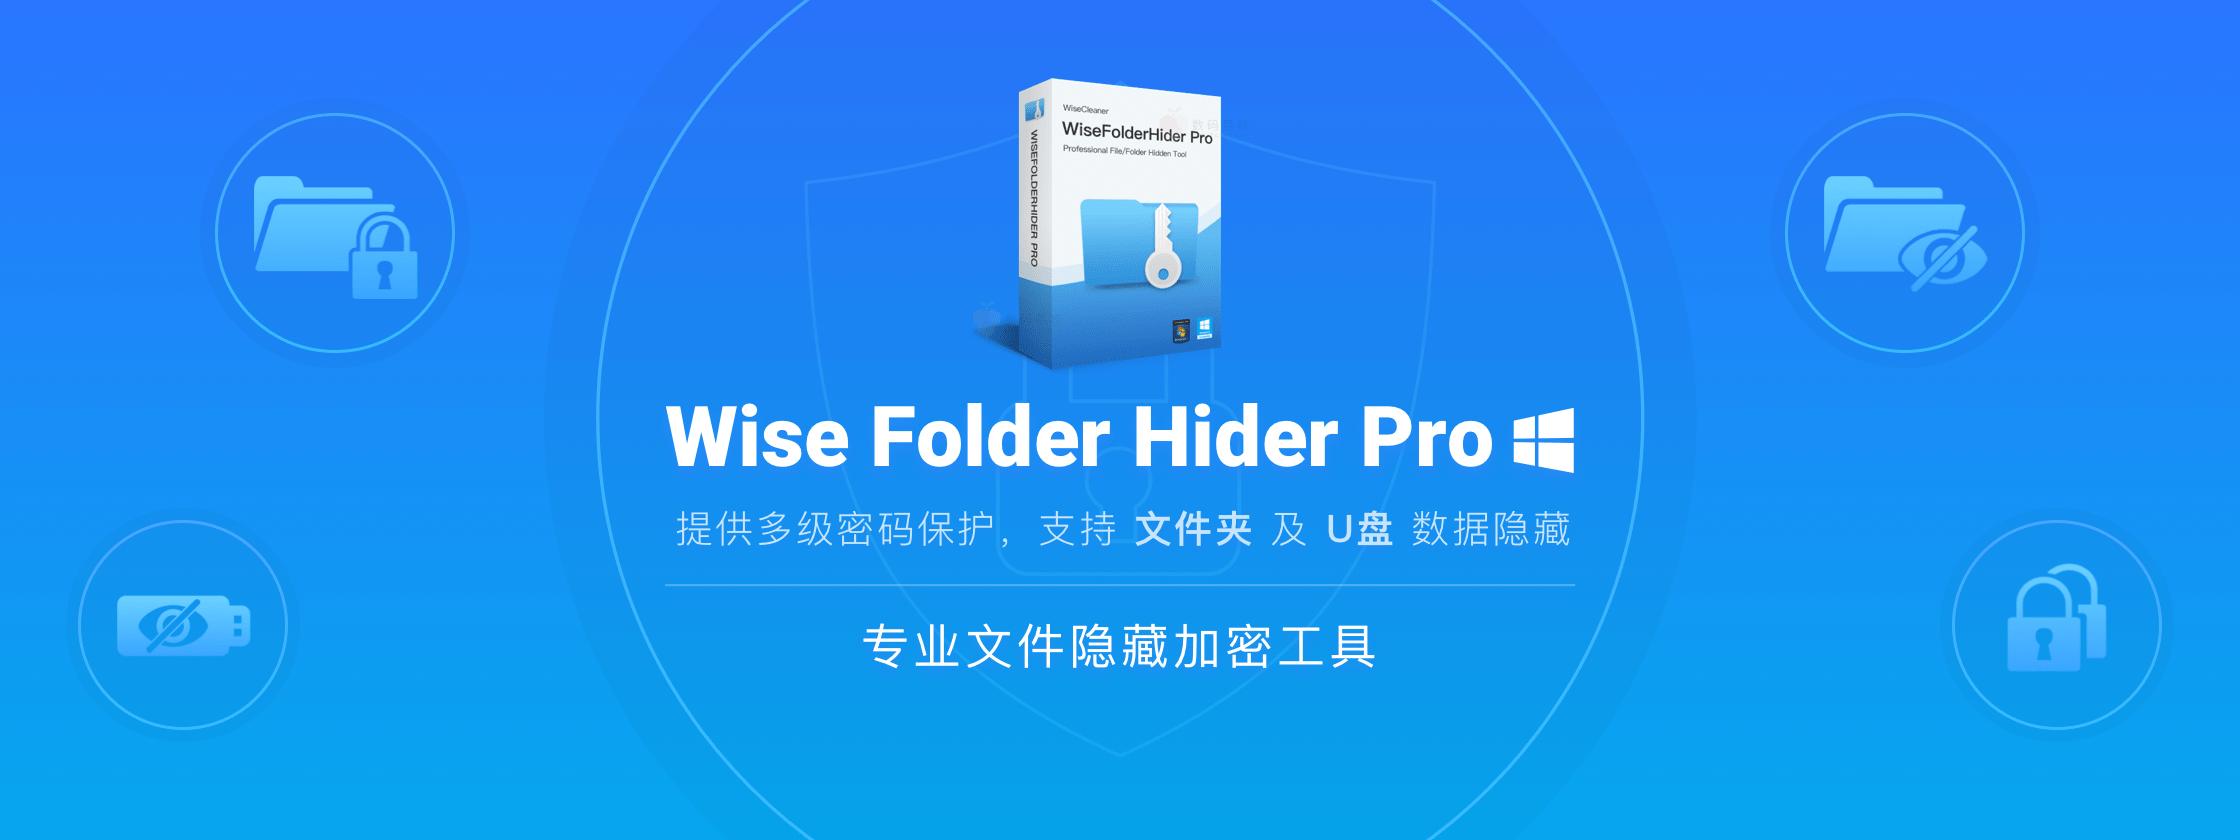 Wise Folder Hider Pro – 轻松加密和隐藏文件